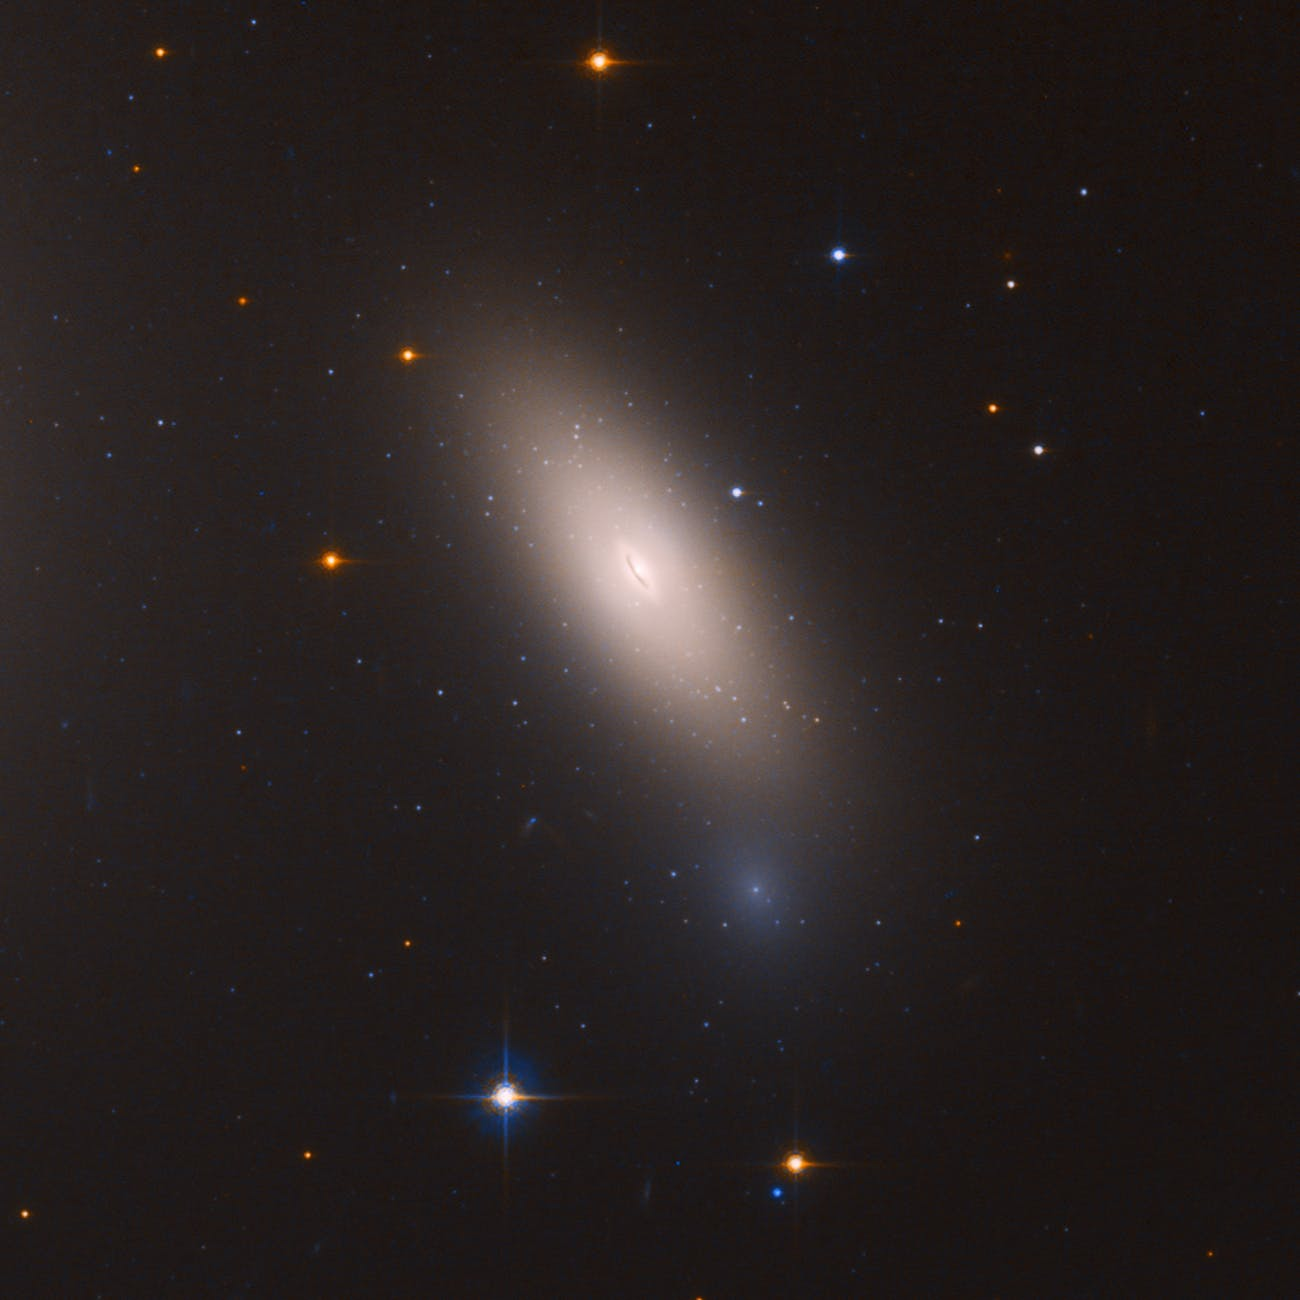 Galaxy NGC 1277